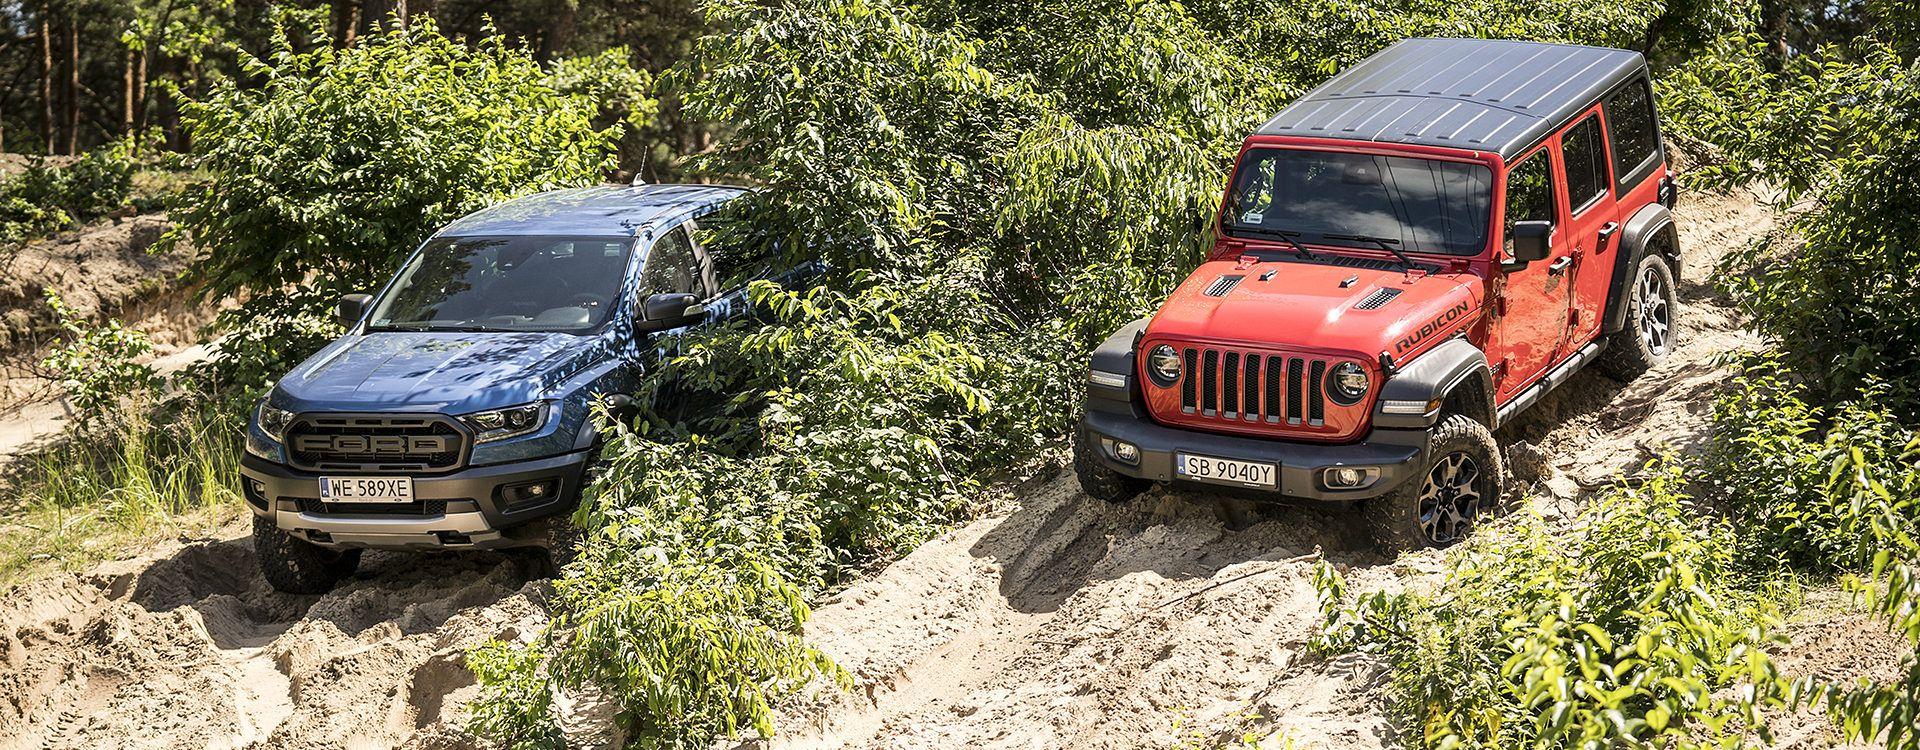 Ford Ranger Raptor vs. Jeep Wrangler Rubicon